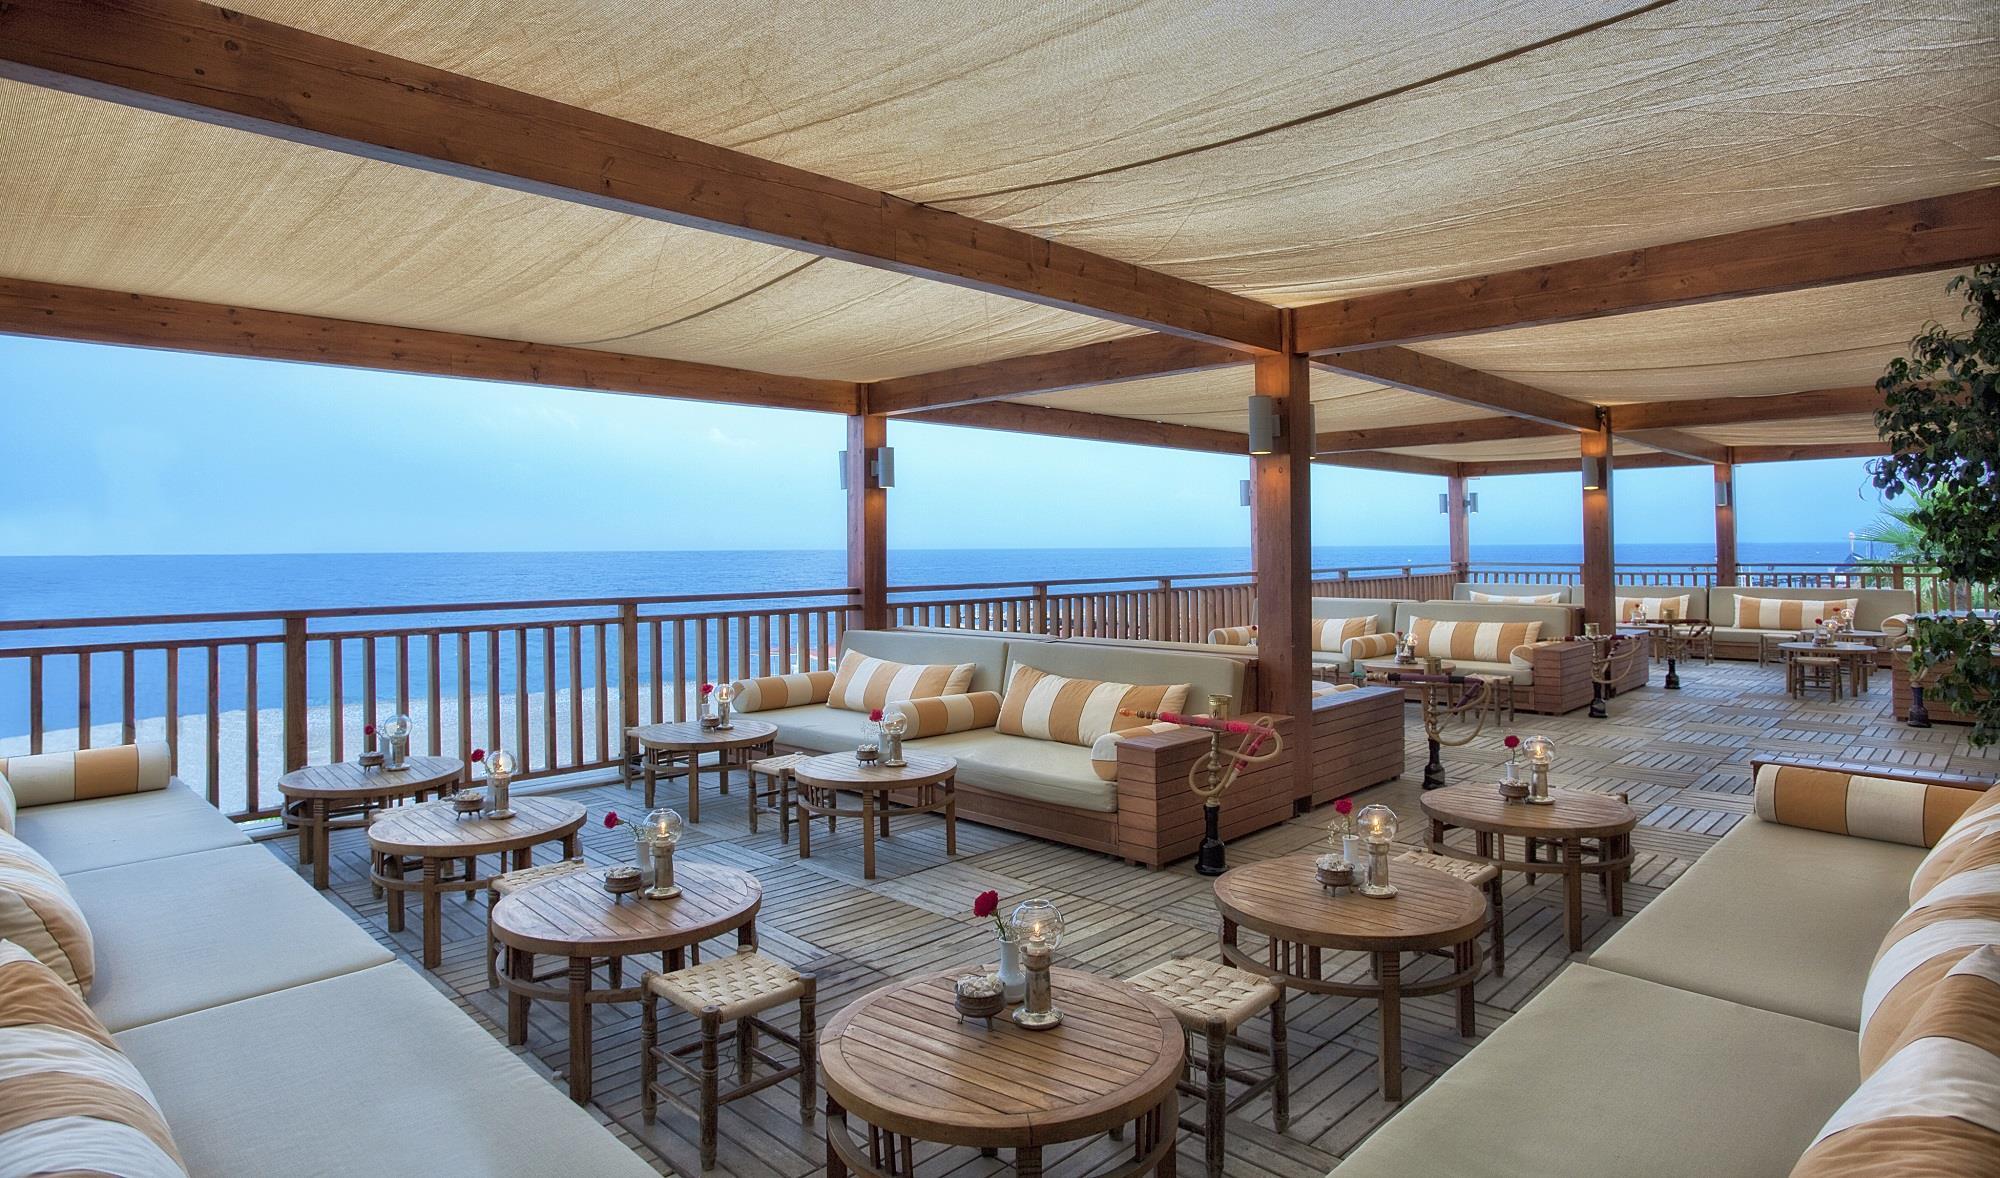 http://www.orextravel.sk/OREX/hotelphotos/akka-hotels-alinda-general-001.jpg